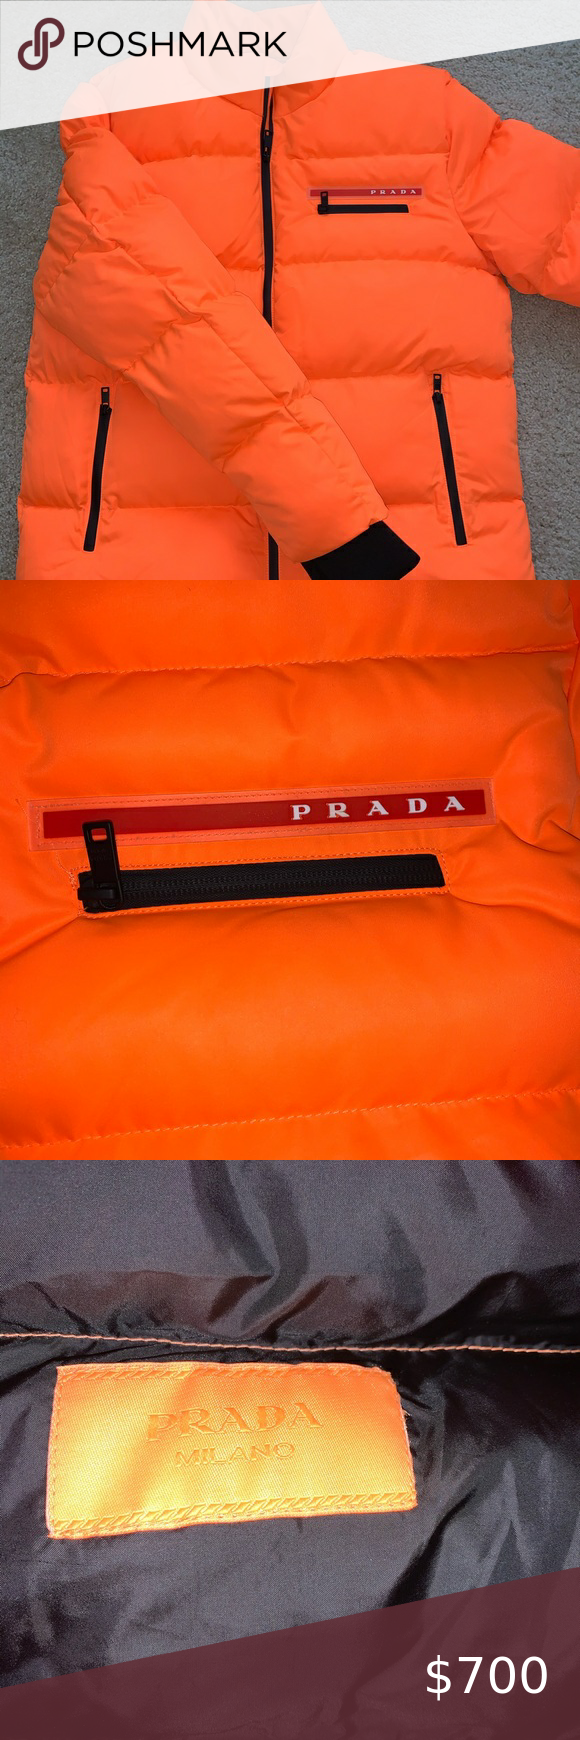 Authentic Prada Neon Puffer Jacket Orange Puffer Jacket Clothes Design Jacket Brands [ 1740 x 580 Pixel ]